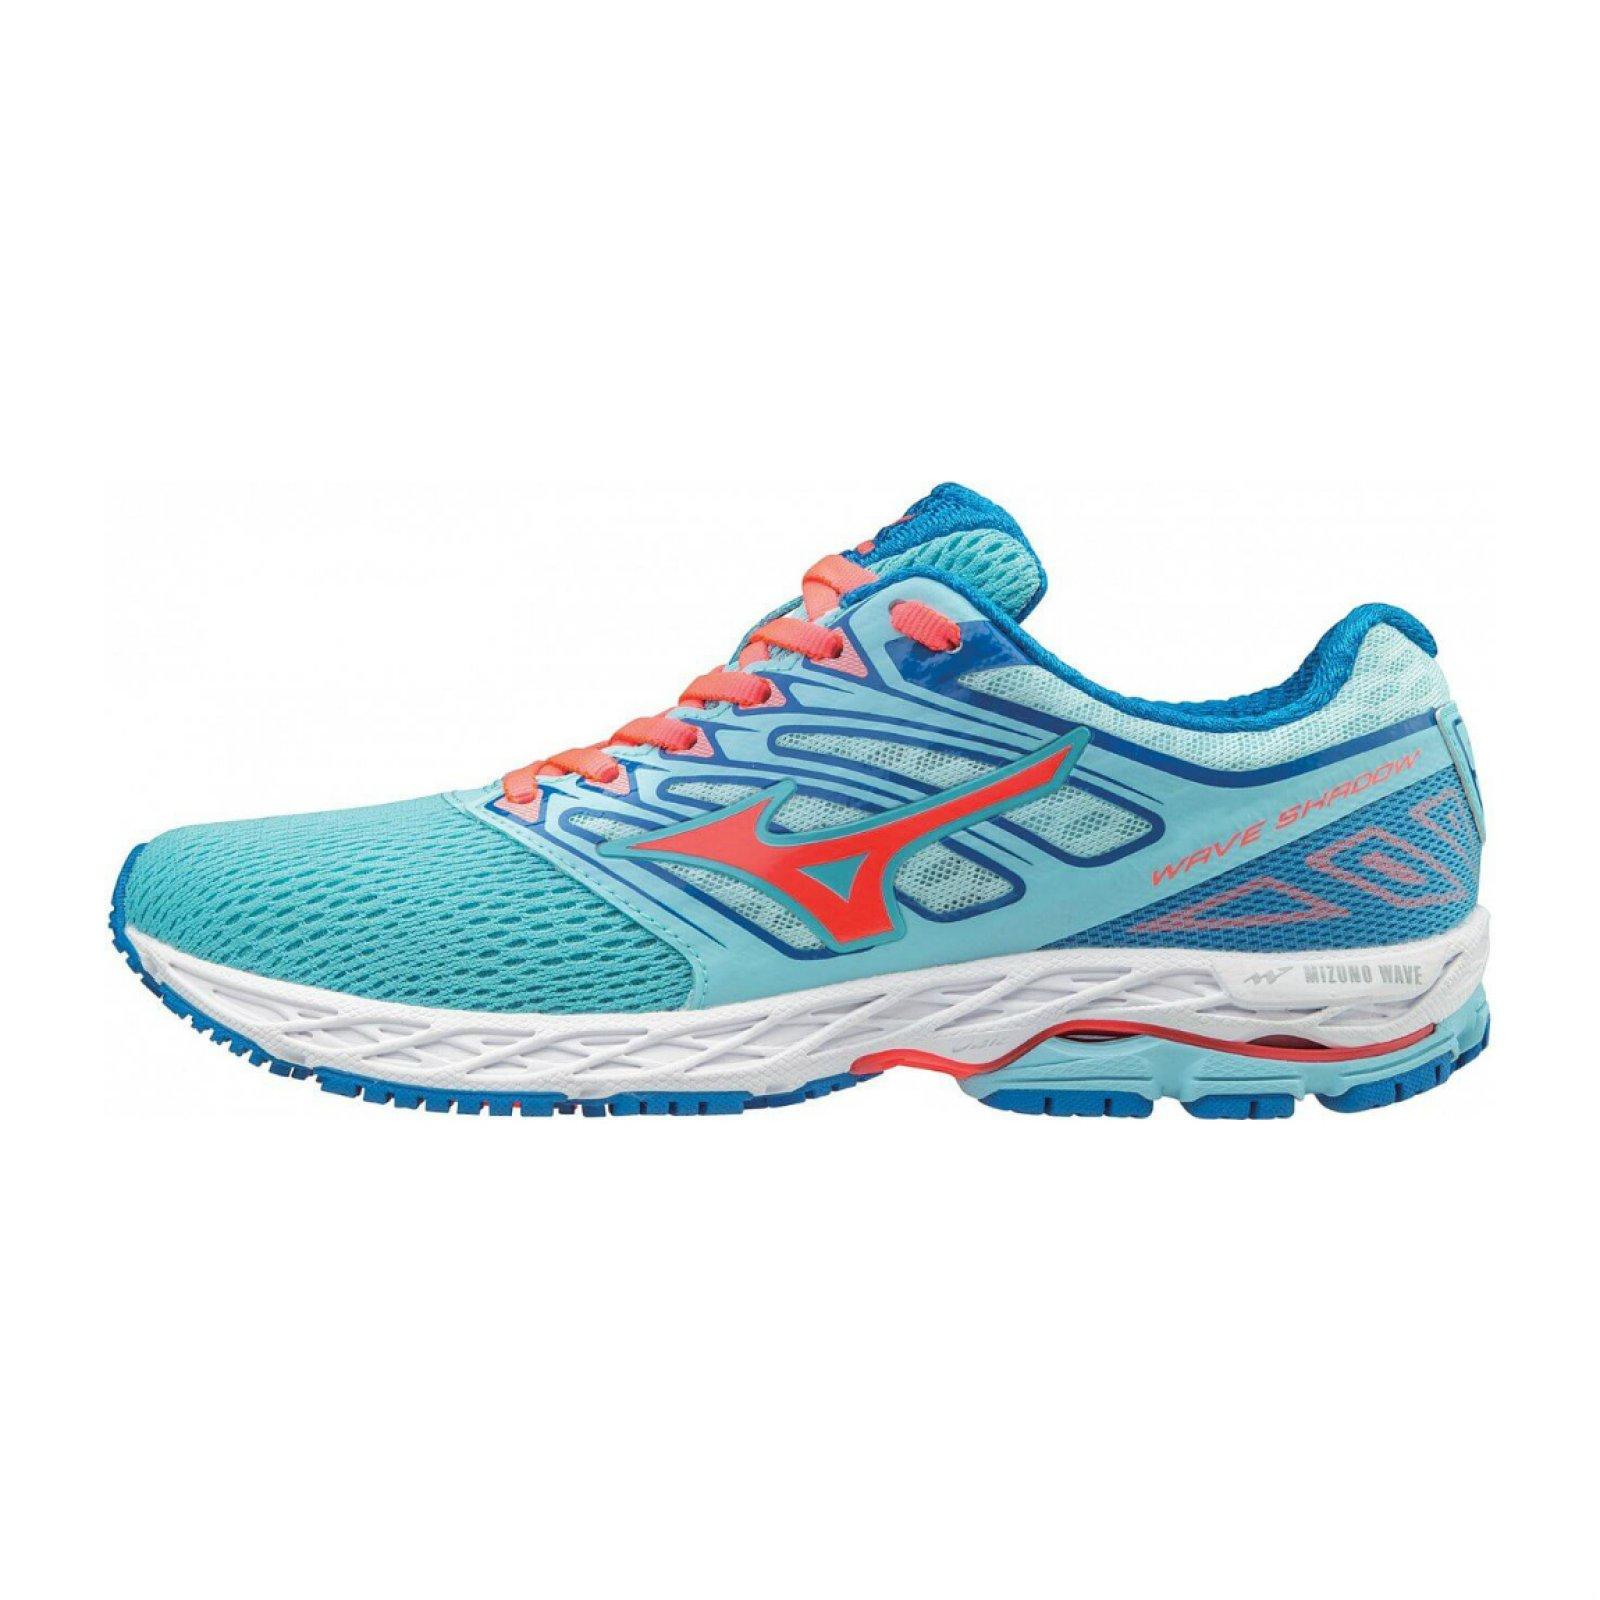 Silniční běžecké boty Mizuno Wave Shadow W J1GD173055 - Actisport.cz f9d9eb1ee6